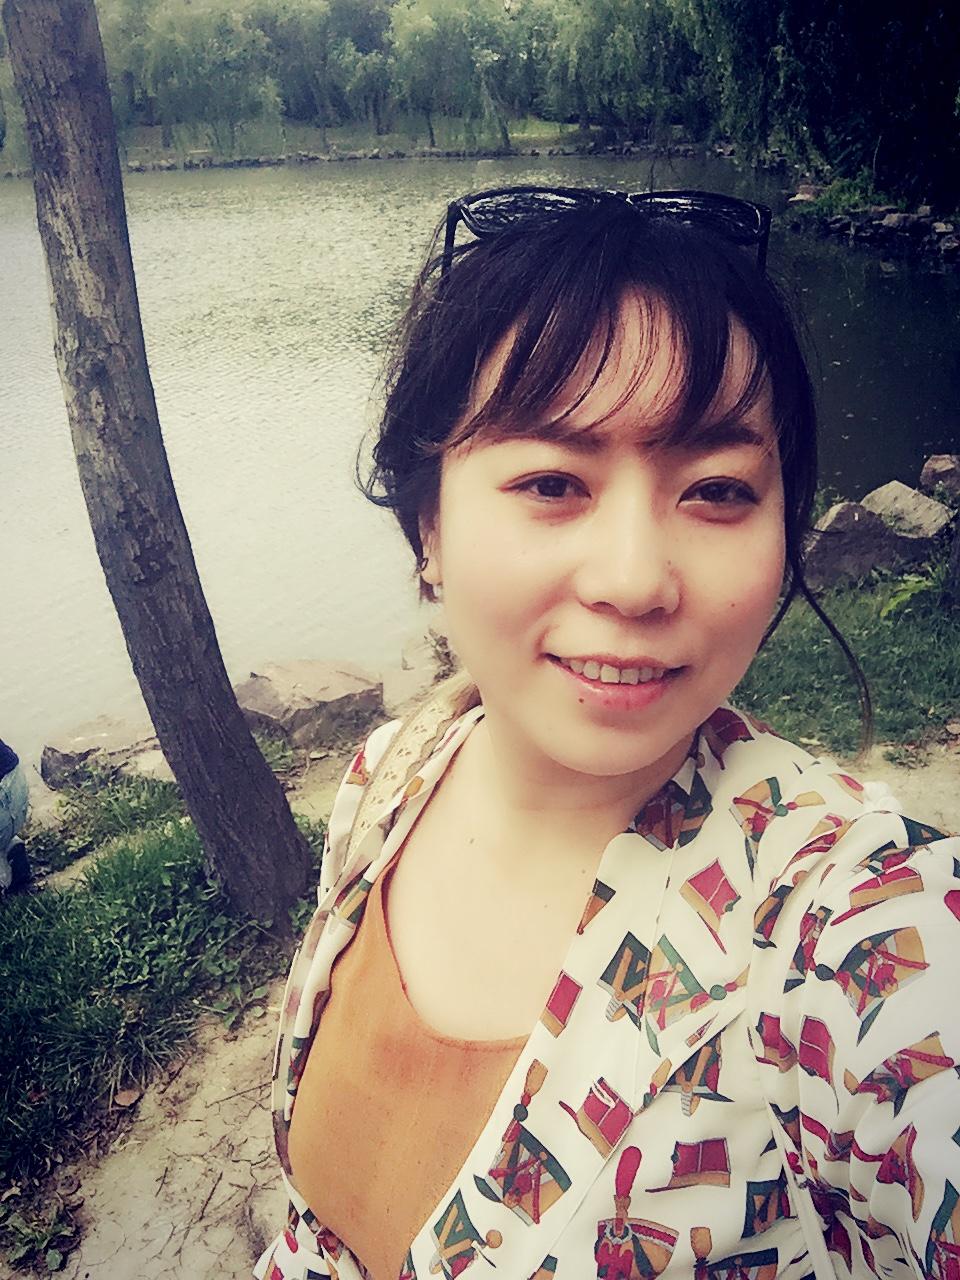 于蕾 Yu Lei